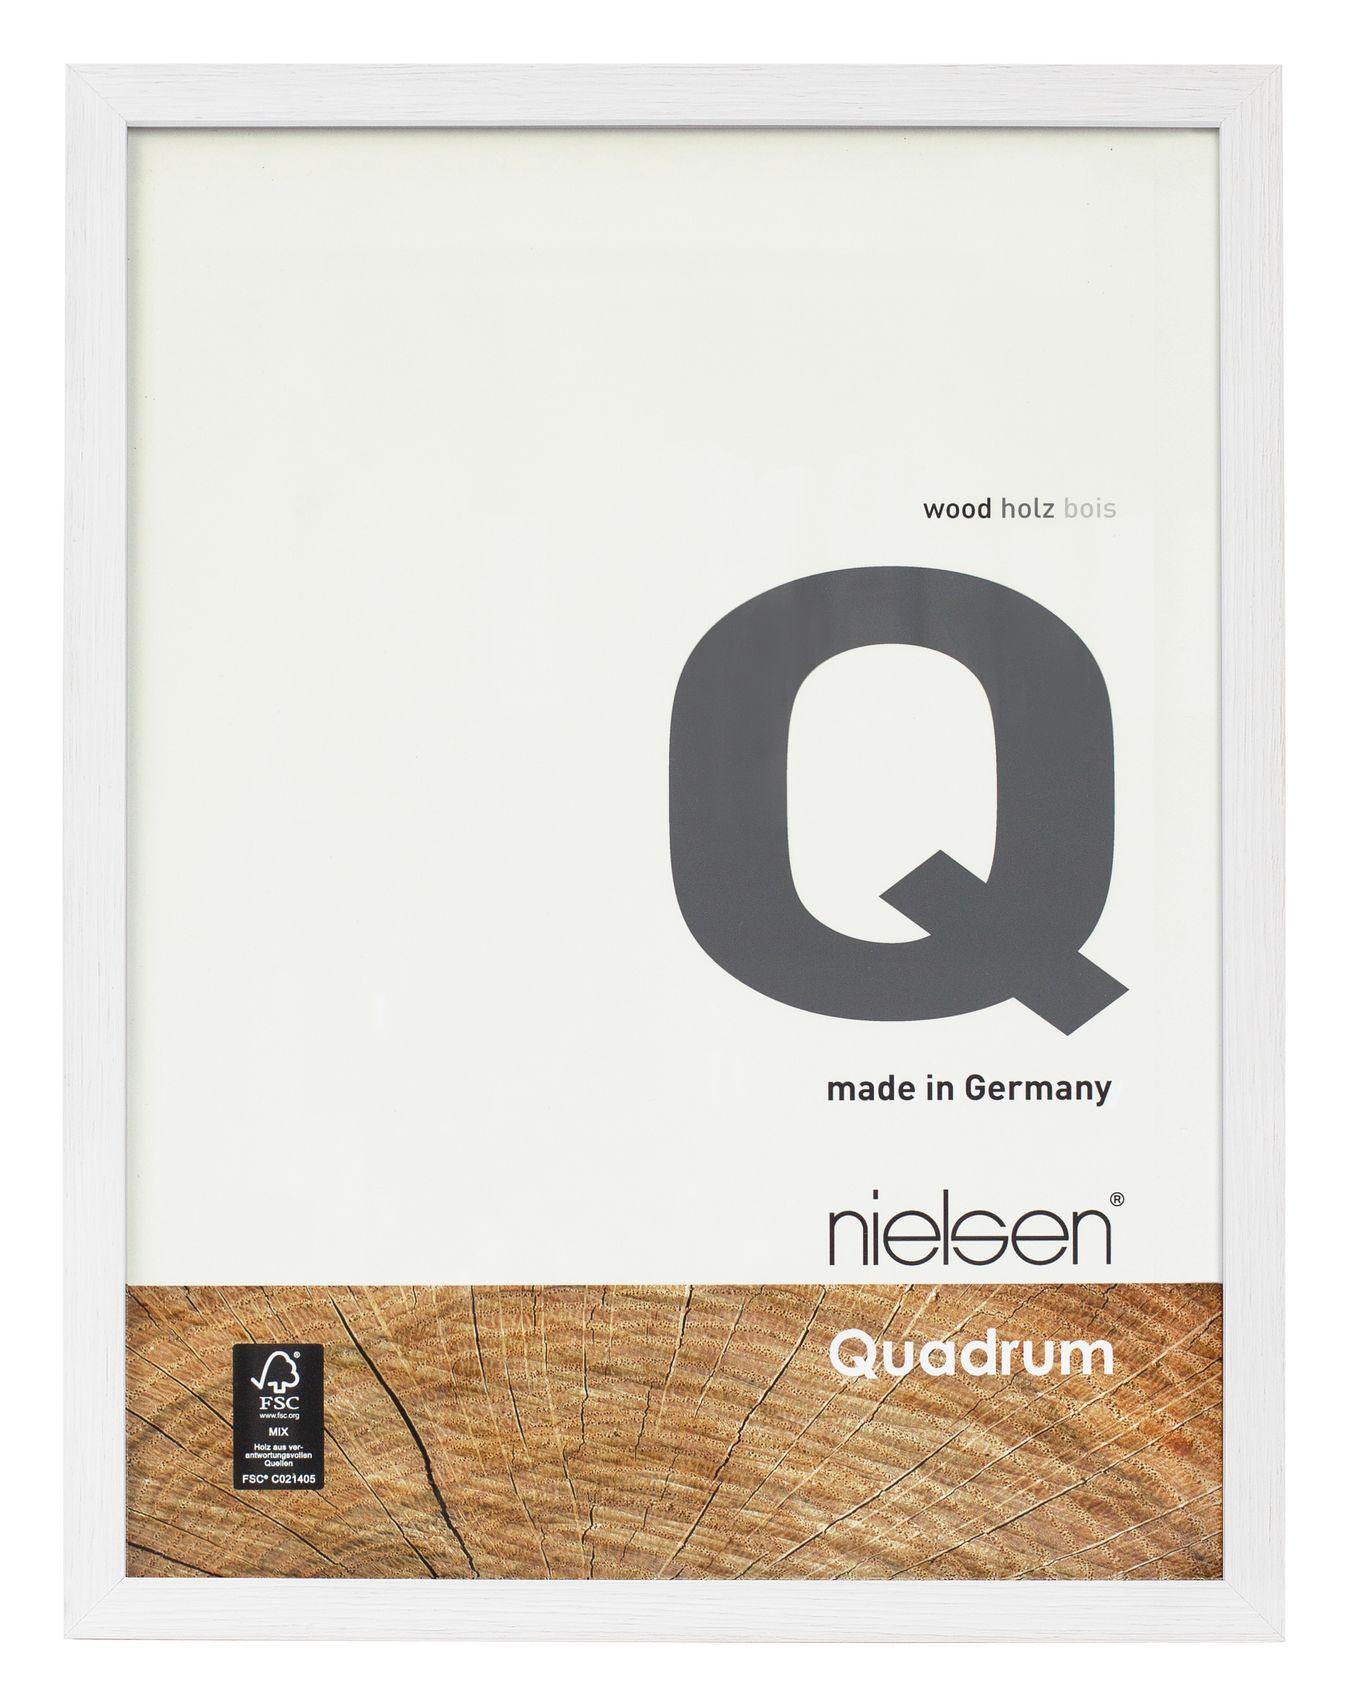 Nielsen Quadrum 30x40 Cm Matt White Wood Picture Frame The Artch